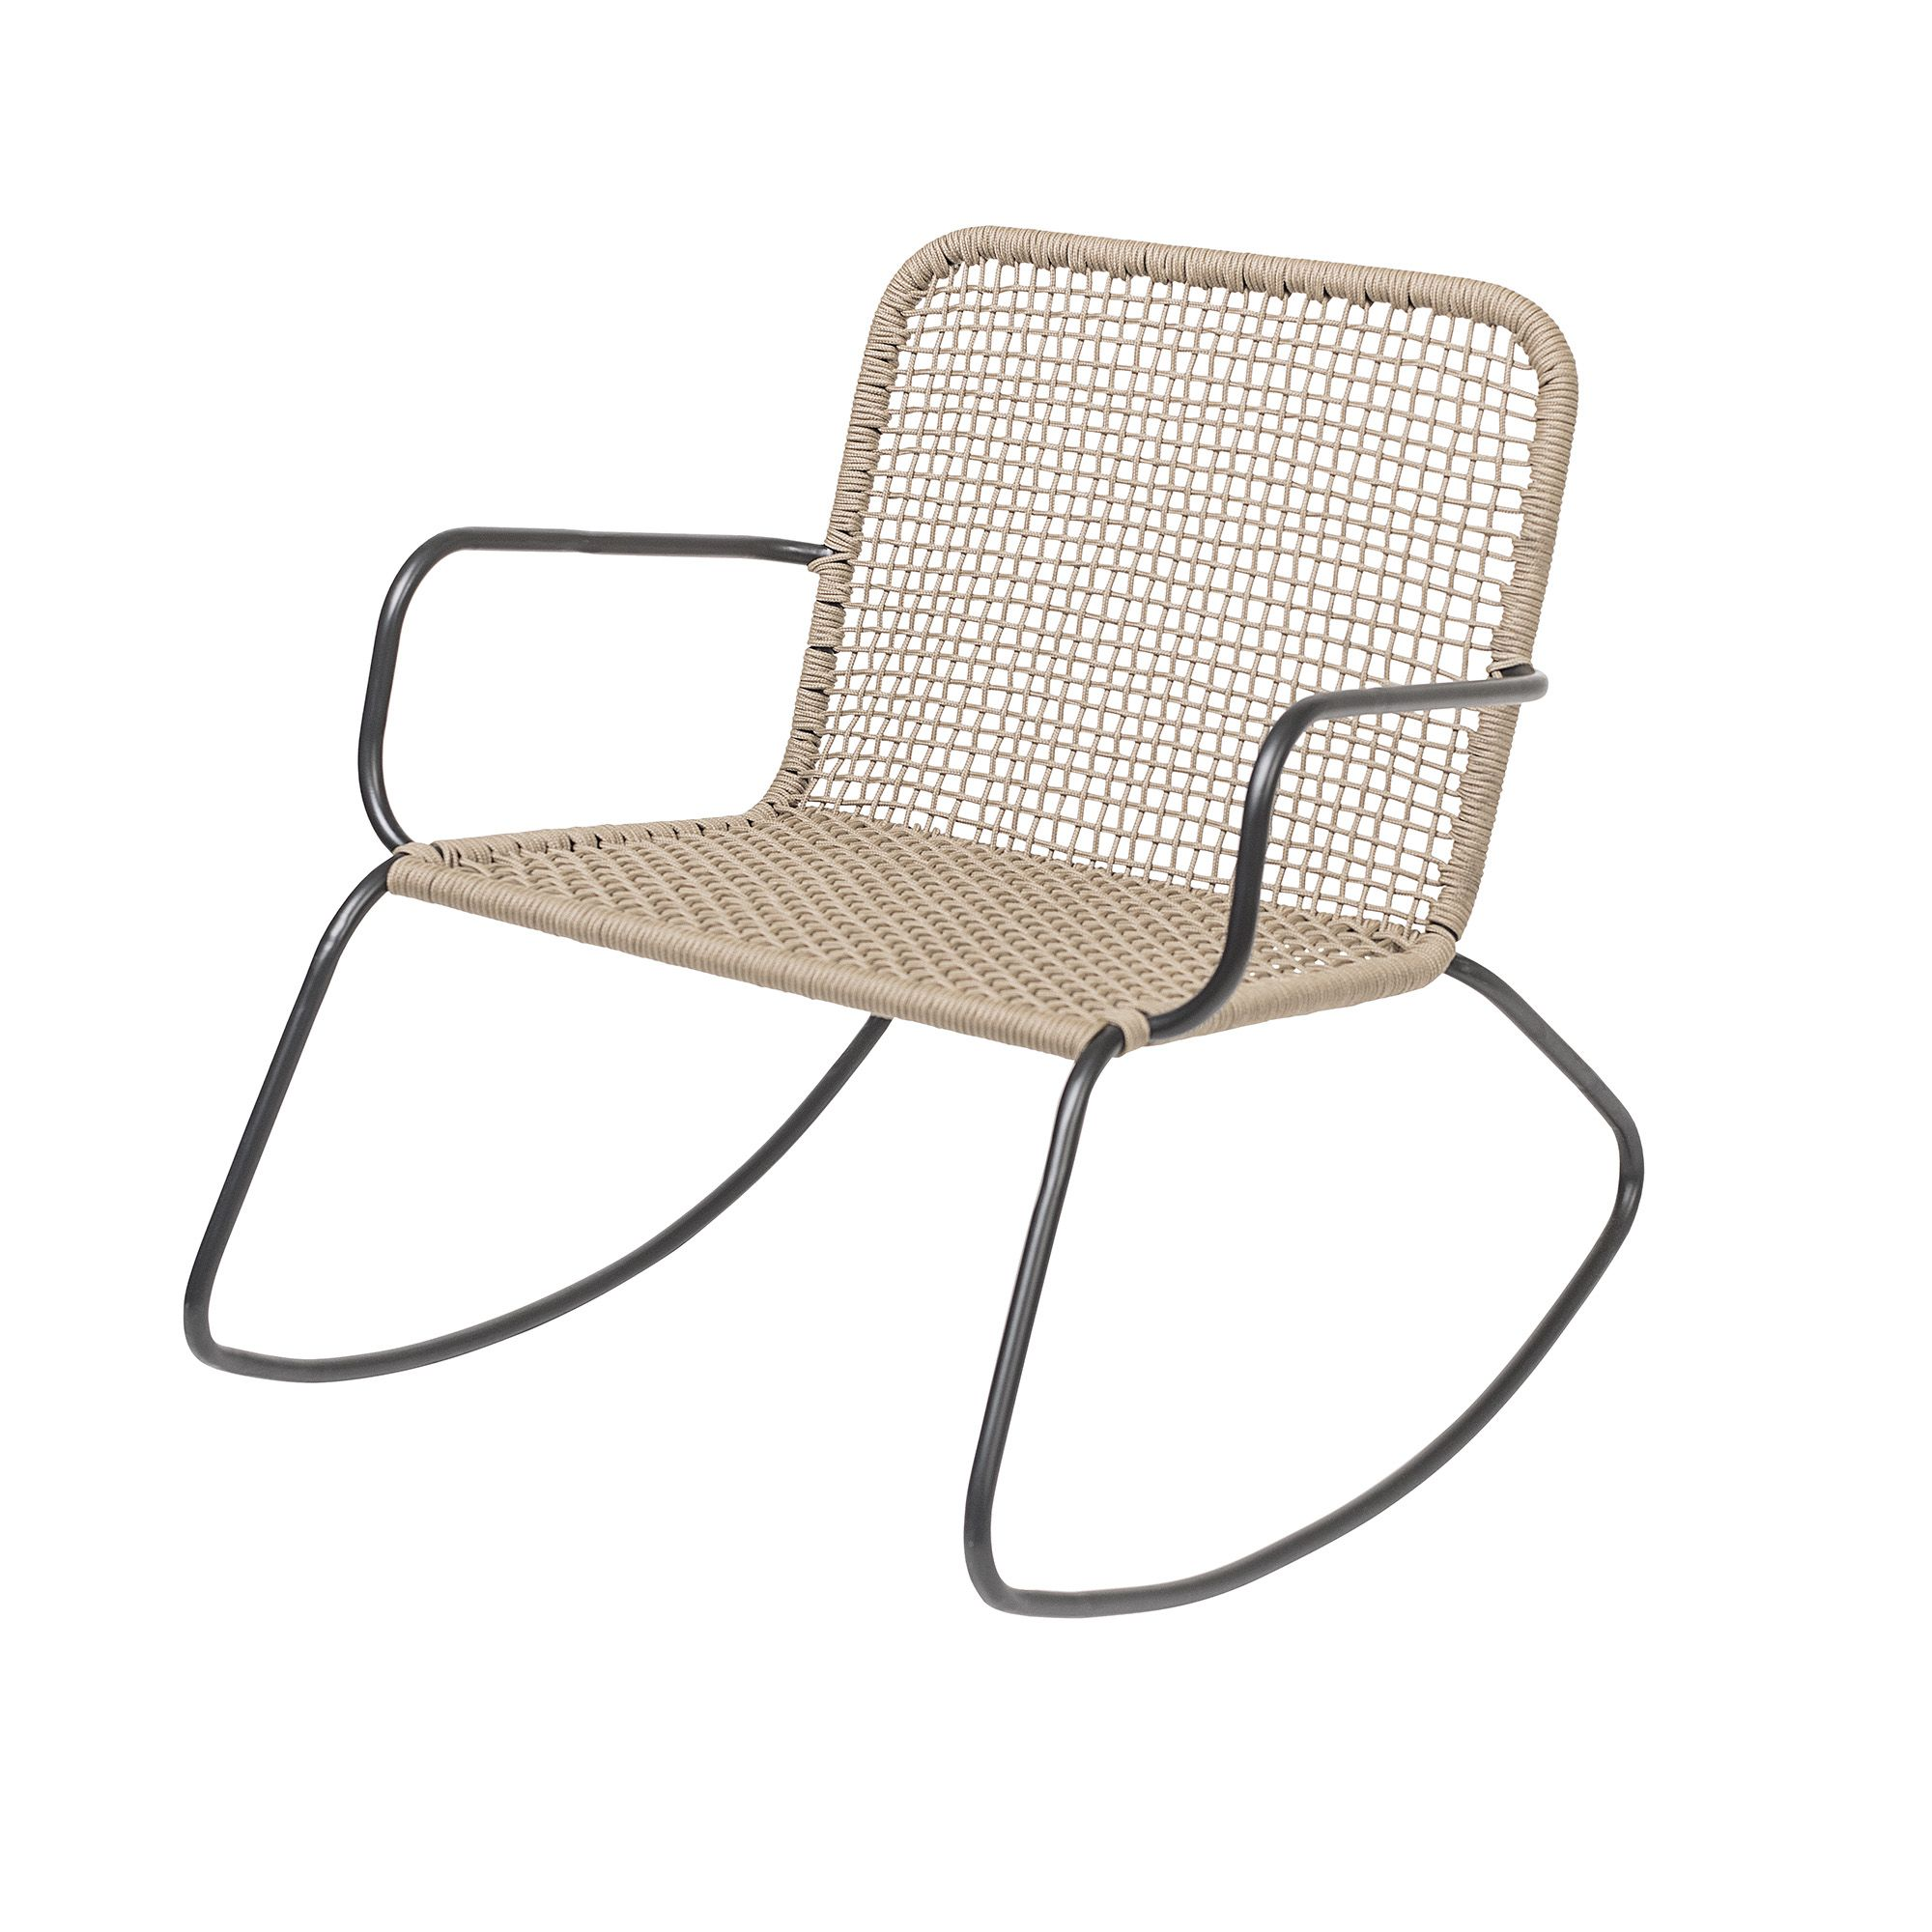 Mundo Rocking Chair 3 Design By Bloomingville Bloomingville Happychanges Ss19 Newcollection M Chaise D Exterieur Fauteuil A Bascule Mobilier De Salon